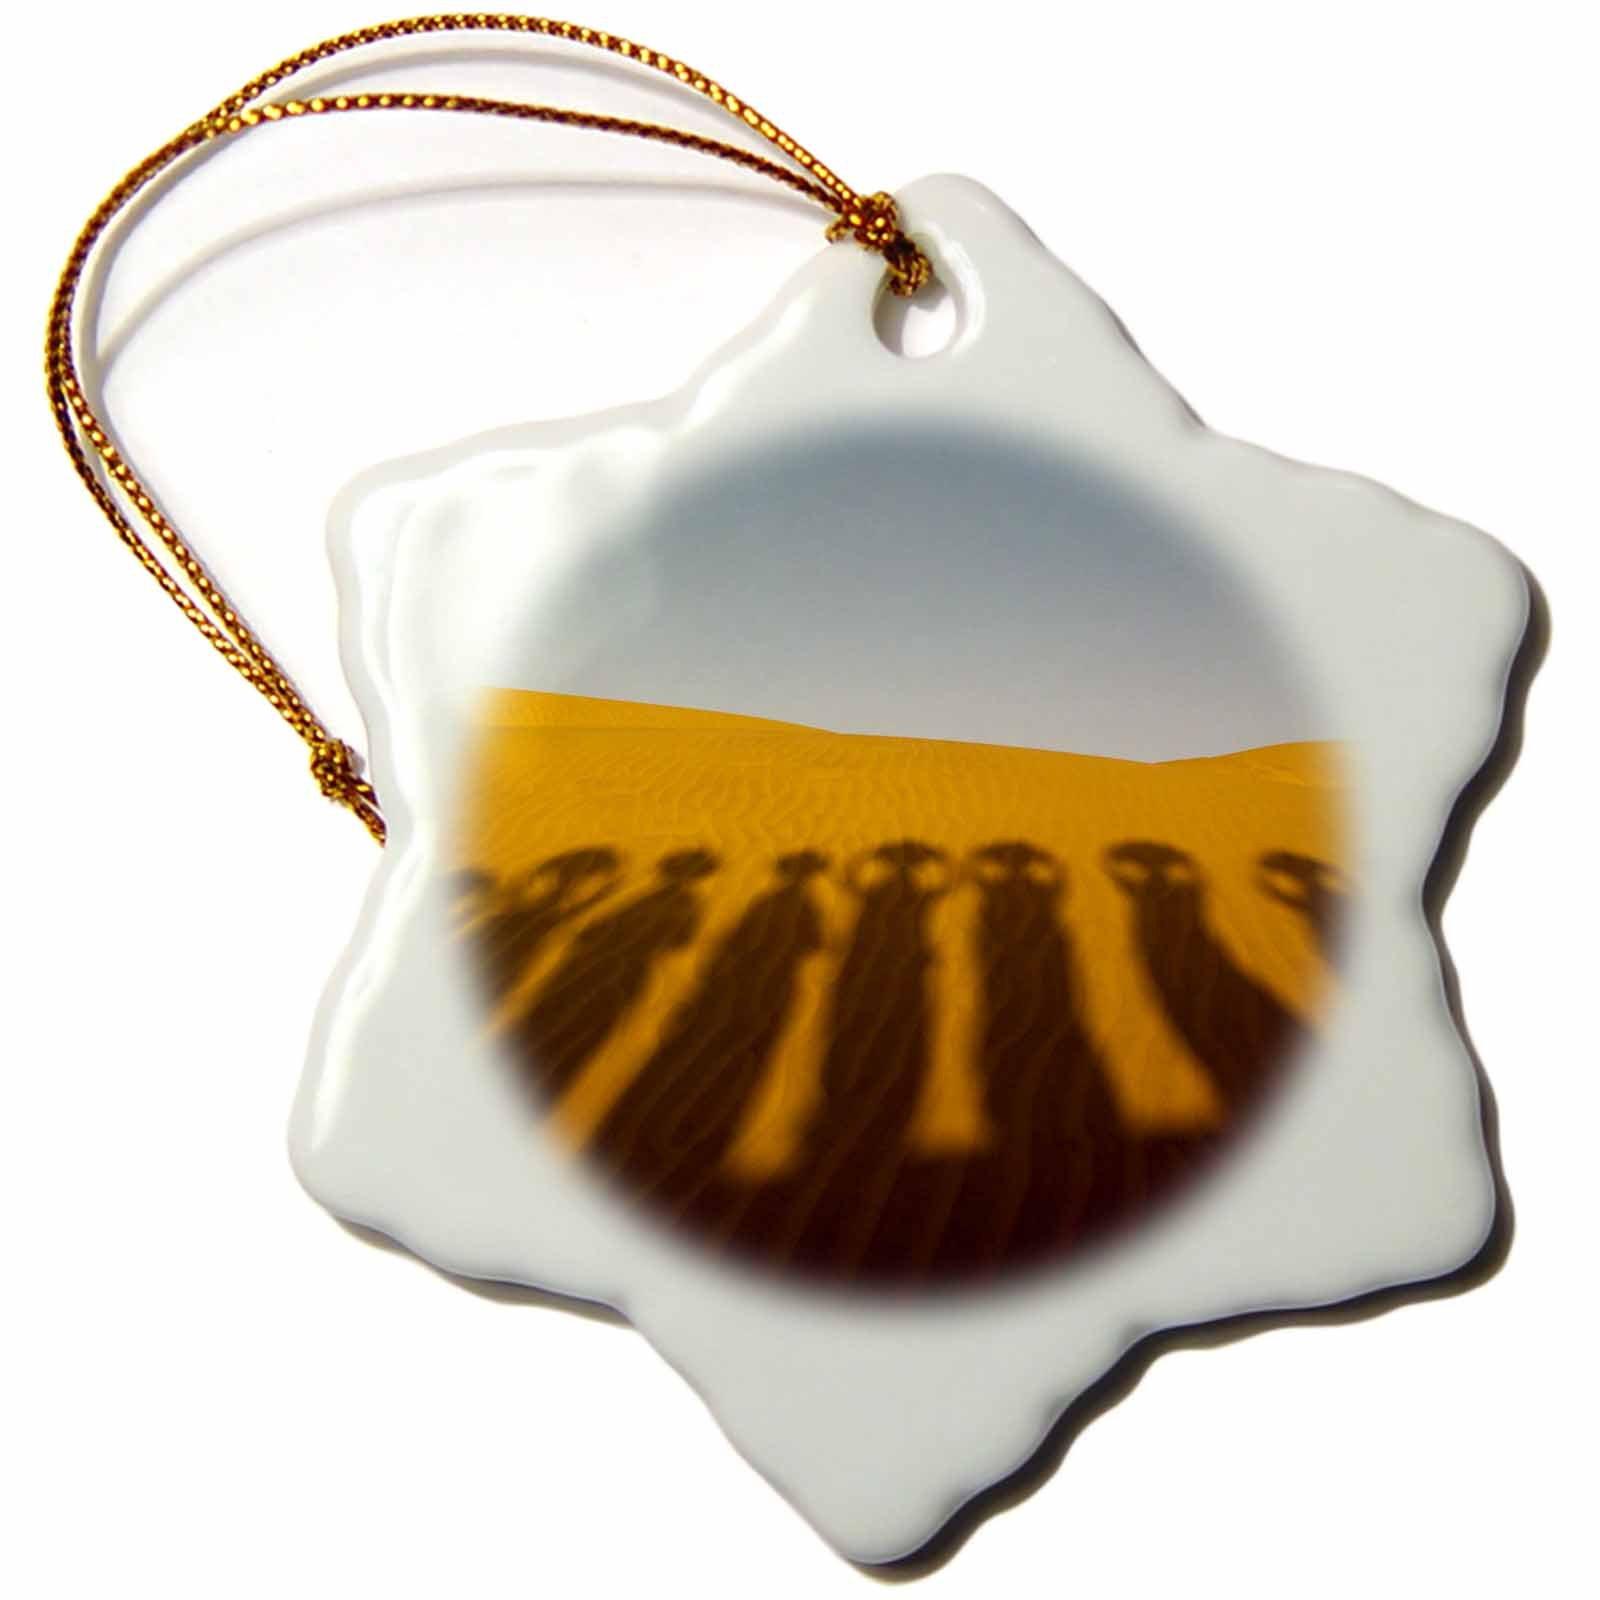 3dRose Danita Delimont - Travel - Shadows of waterbearers, Thar Desert, India - 3 inch Snowflake Porcelain Ornament (orn_276773_1)